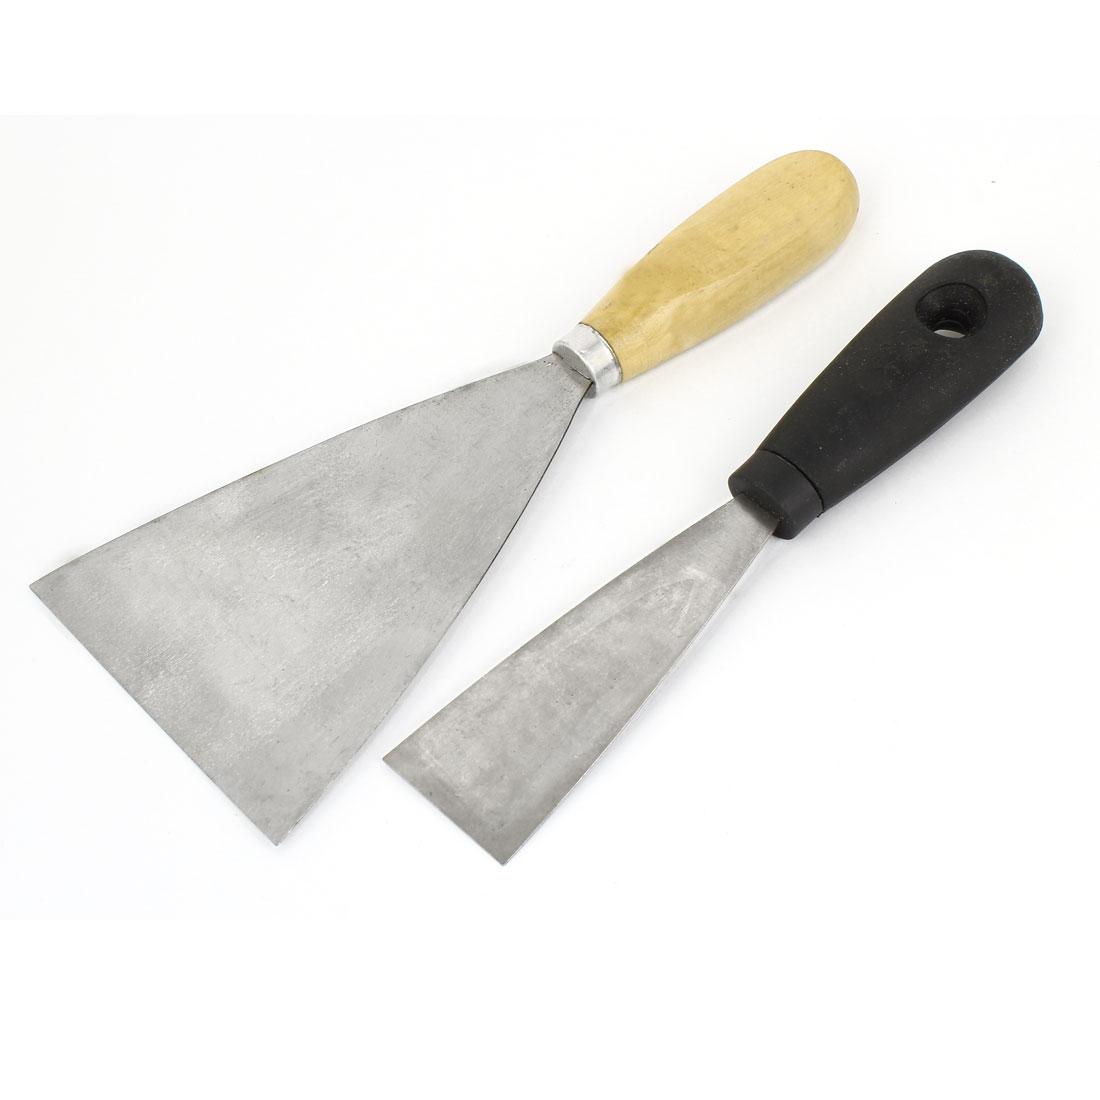 "2pcs 1.5"" 4"" Width Metal Blade Wooden Plastic Handle Drywall Repair Putty Scraper"